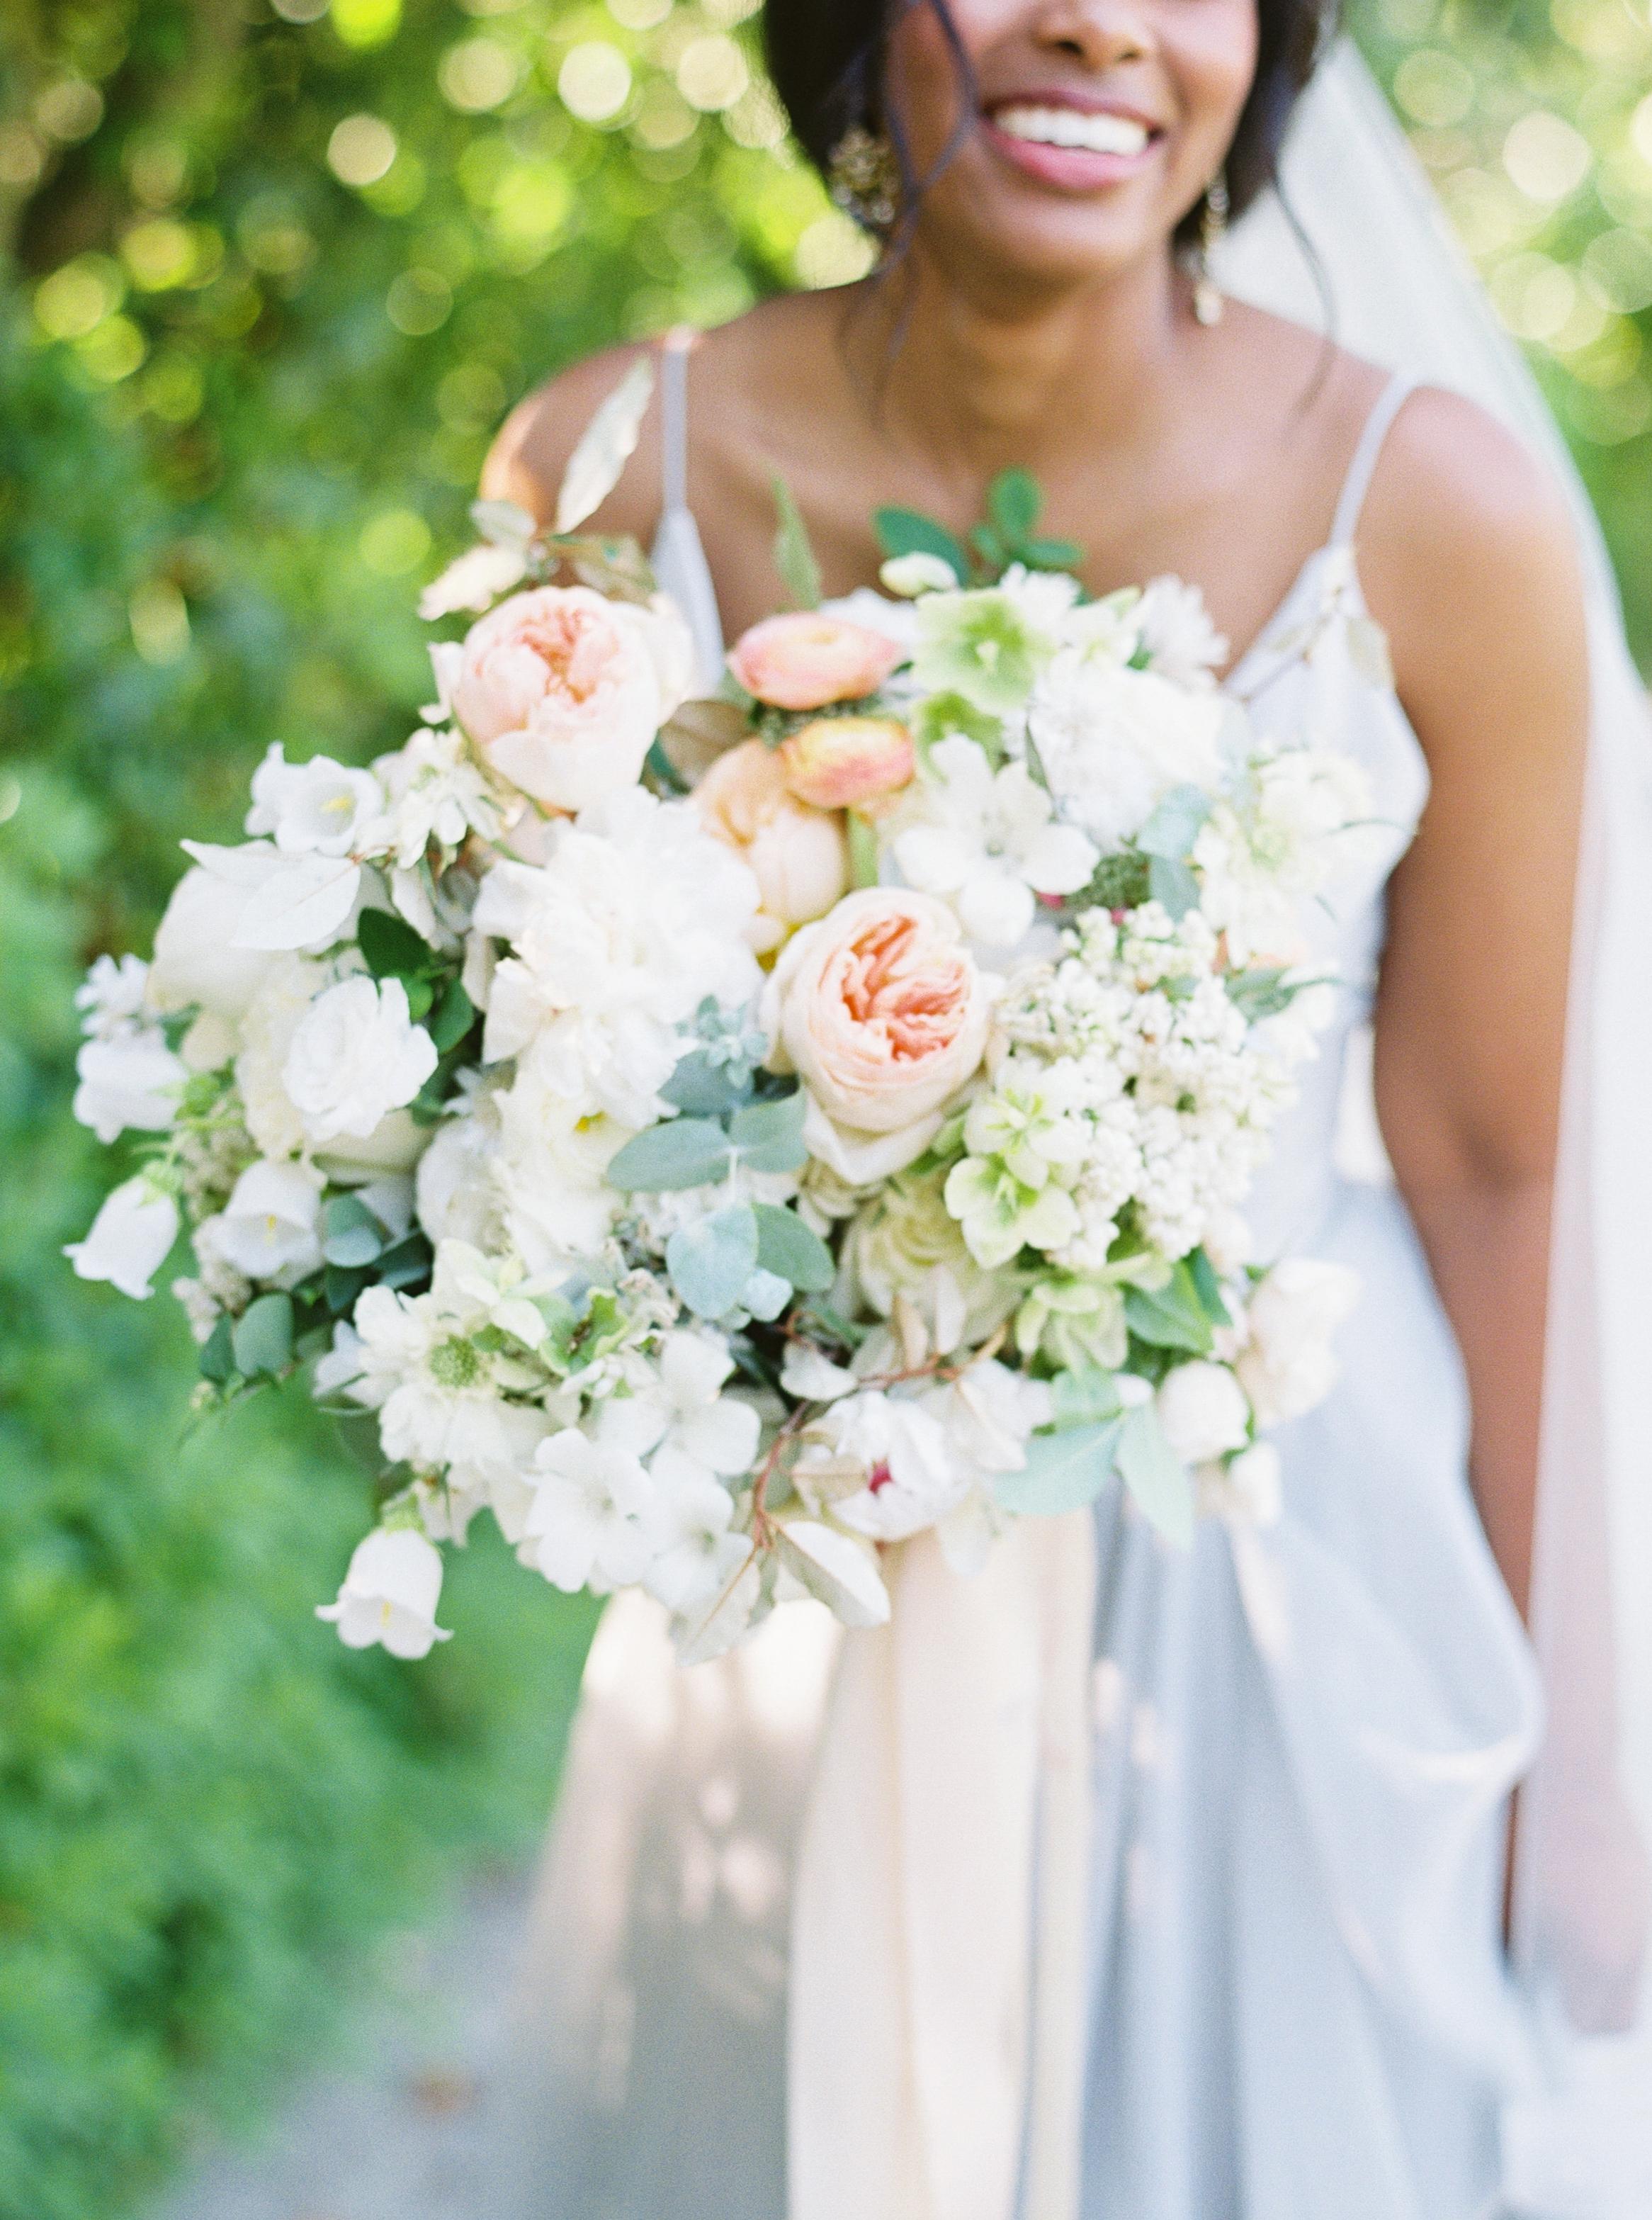 Charleston_Retreat_Kati_Rosado_Fine_Art_Film_Wedding_Photographer-18.jpg